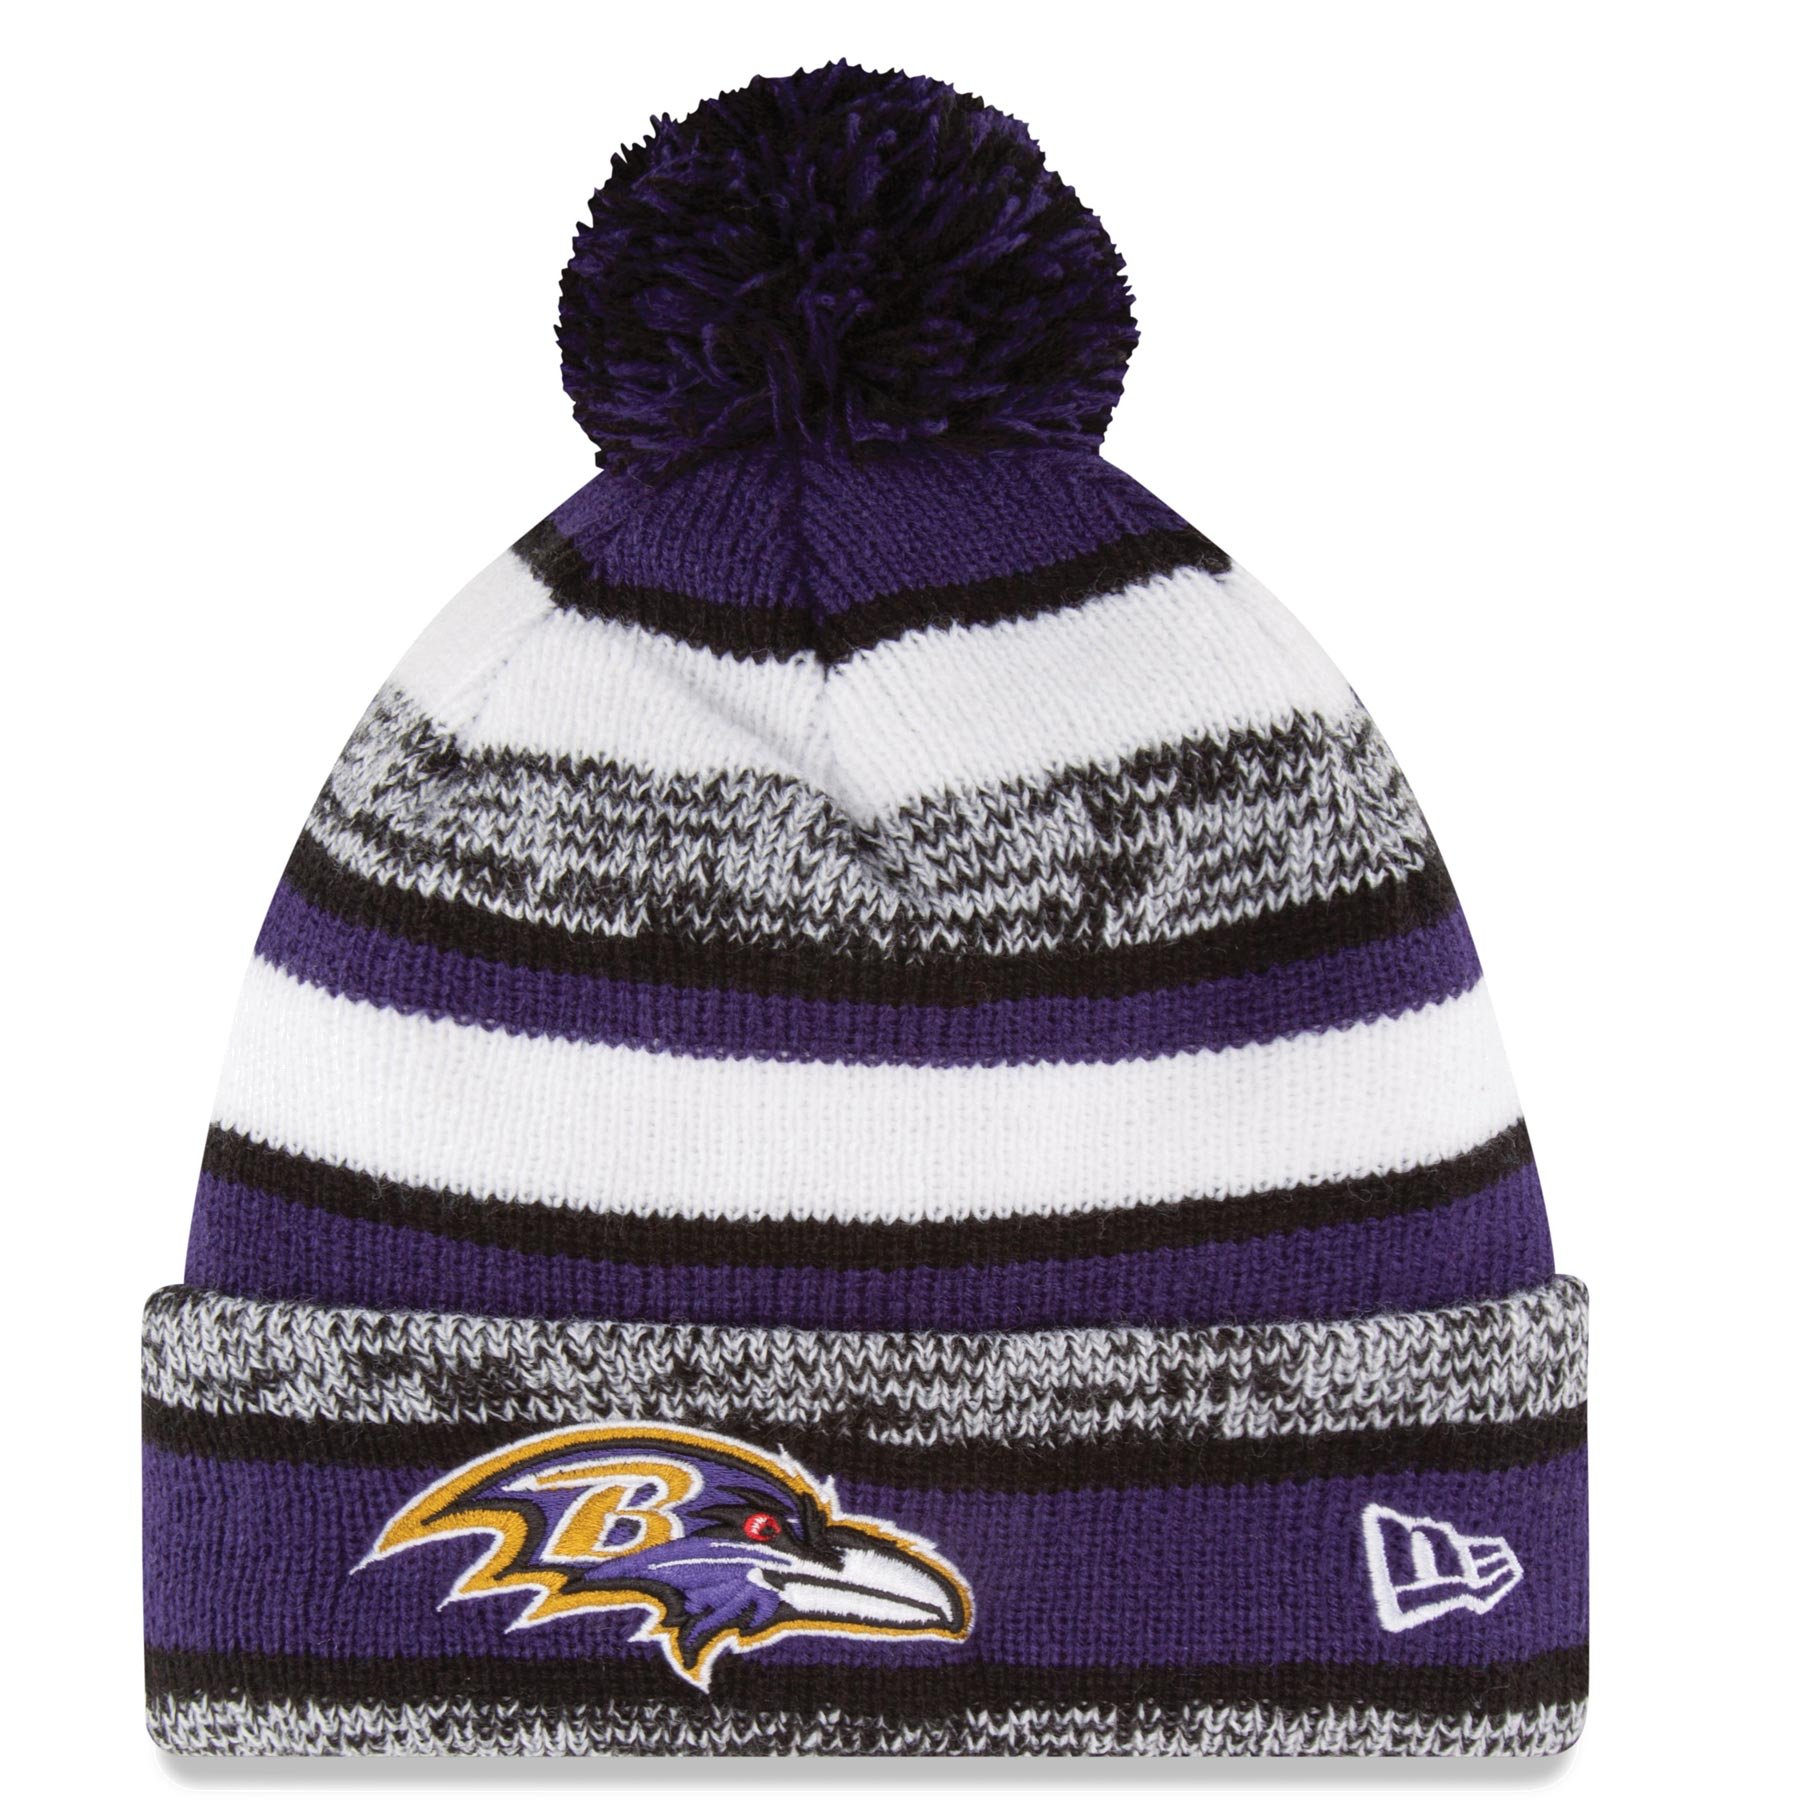 New Era NFL 2014 On-Field Knit Hat (Ravens)